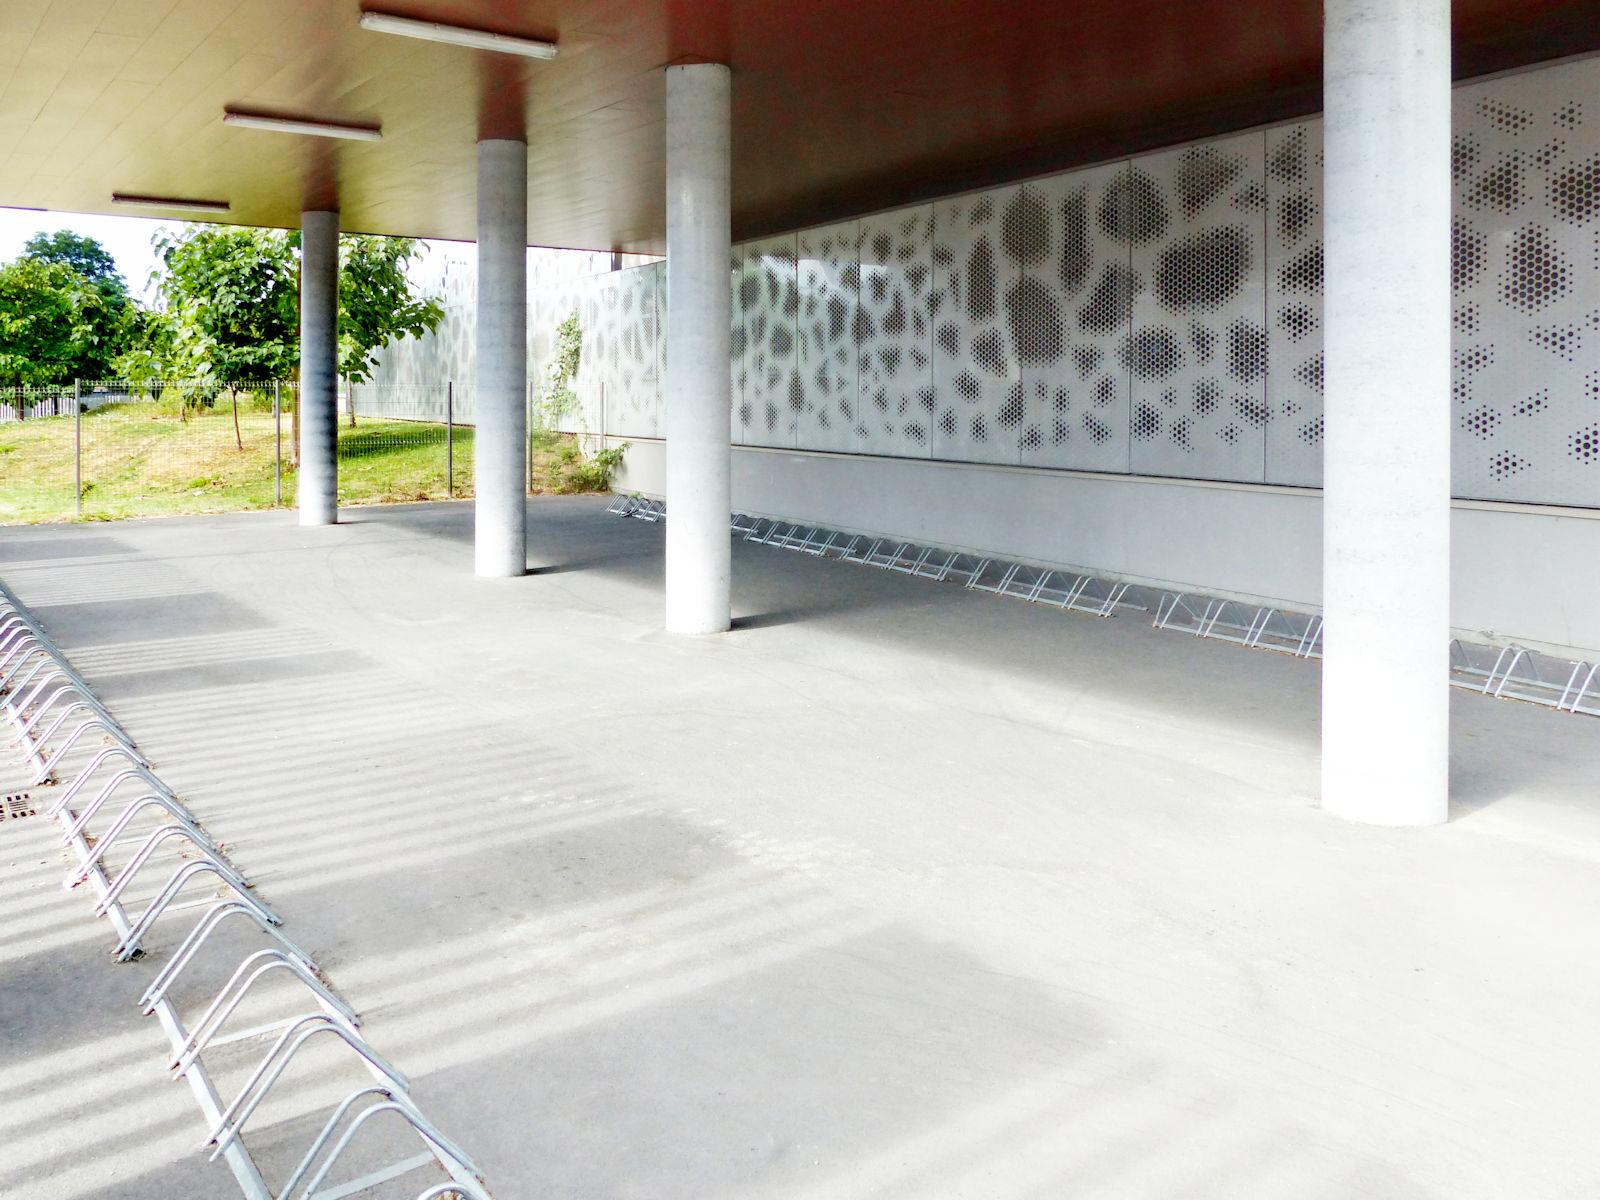 Garage à Vélos collège Marie Curie Tourcoing